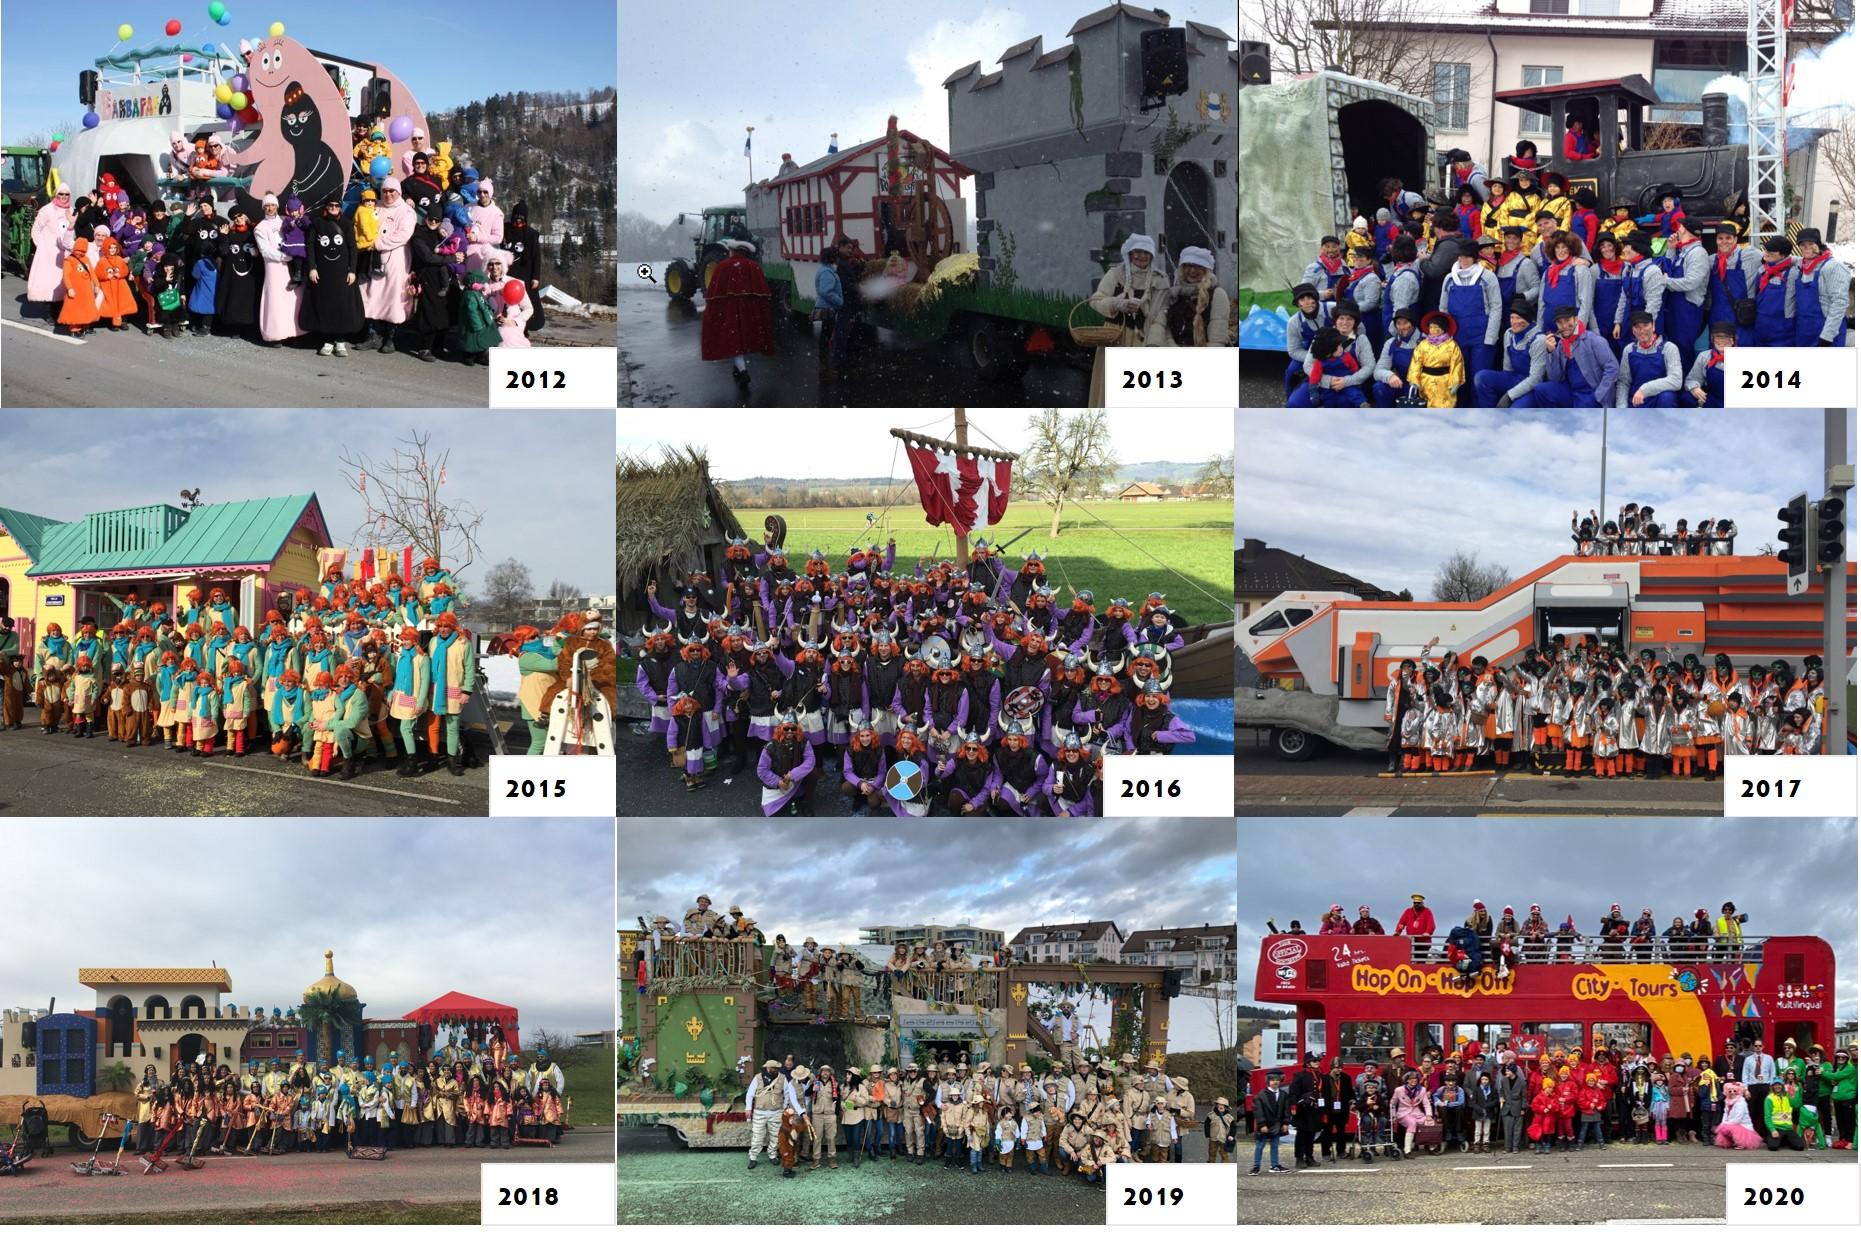 10 Jahre Wagenbaugruppe Rumpelstilz Baar